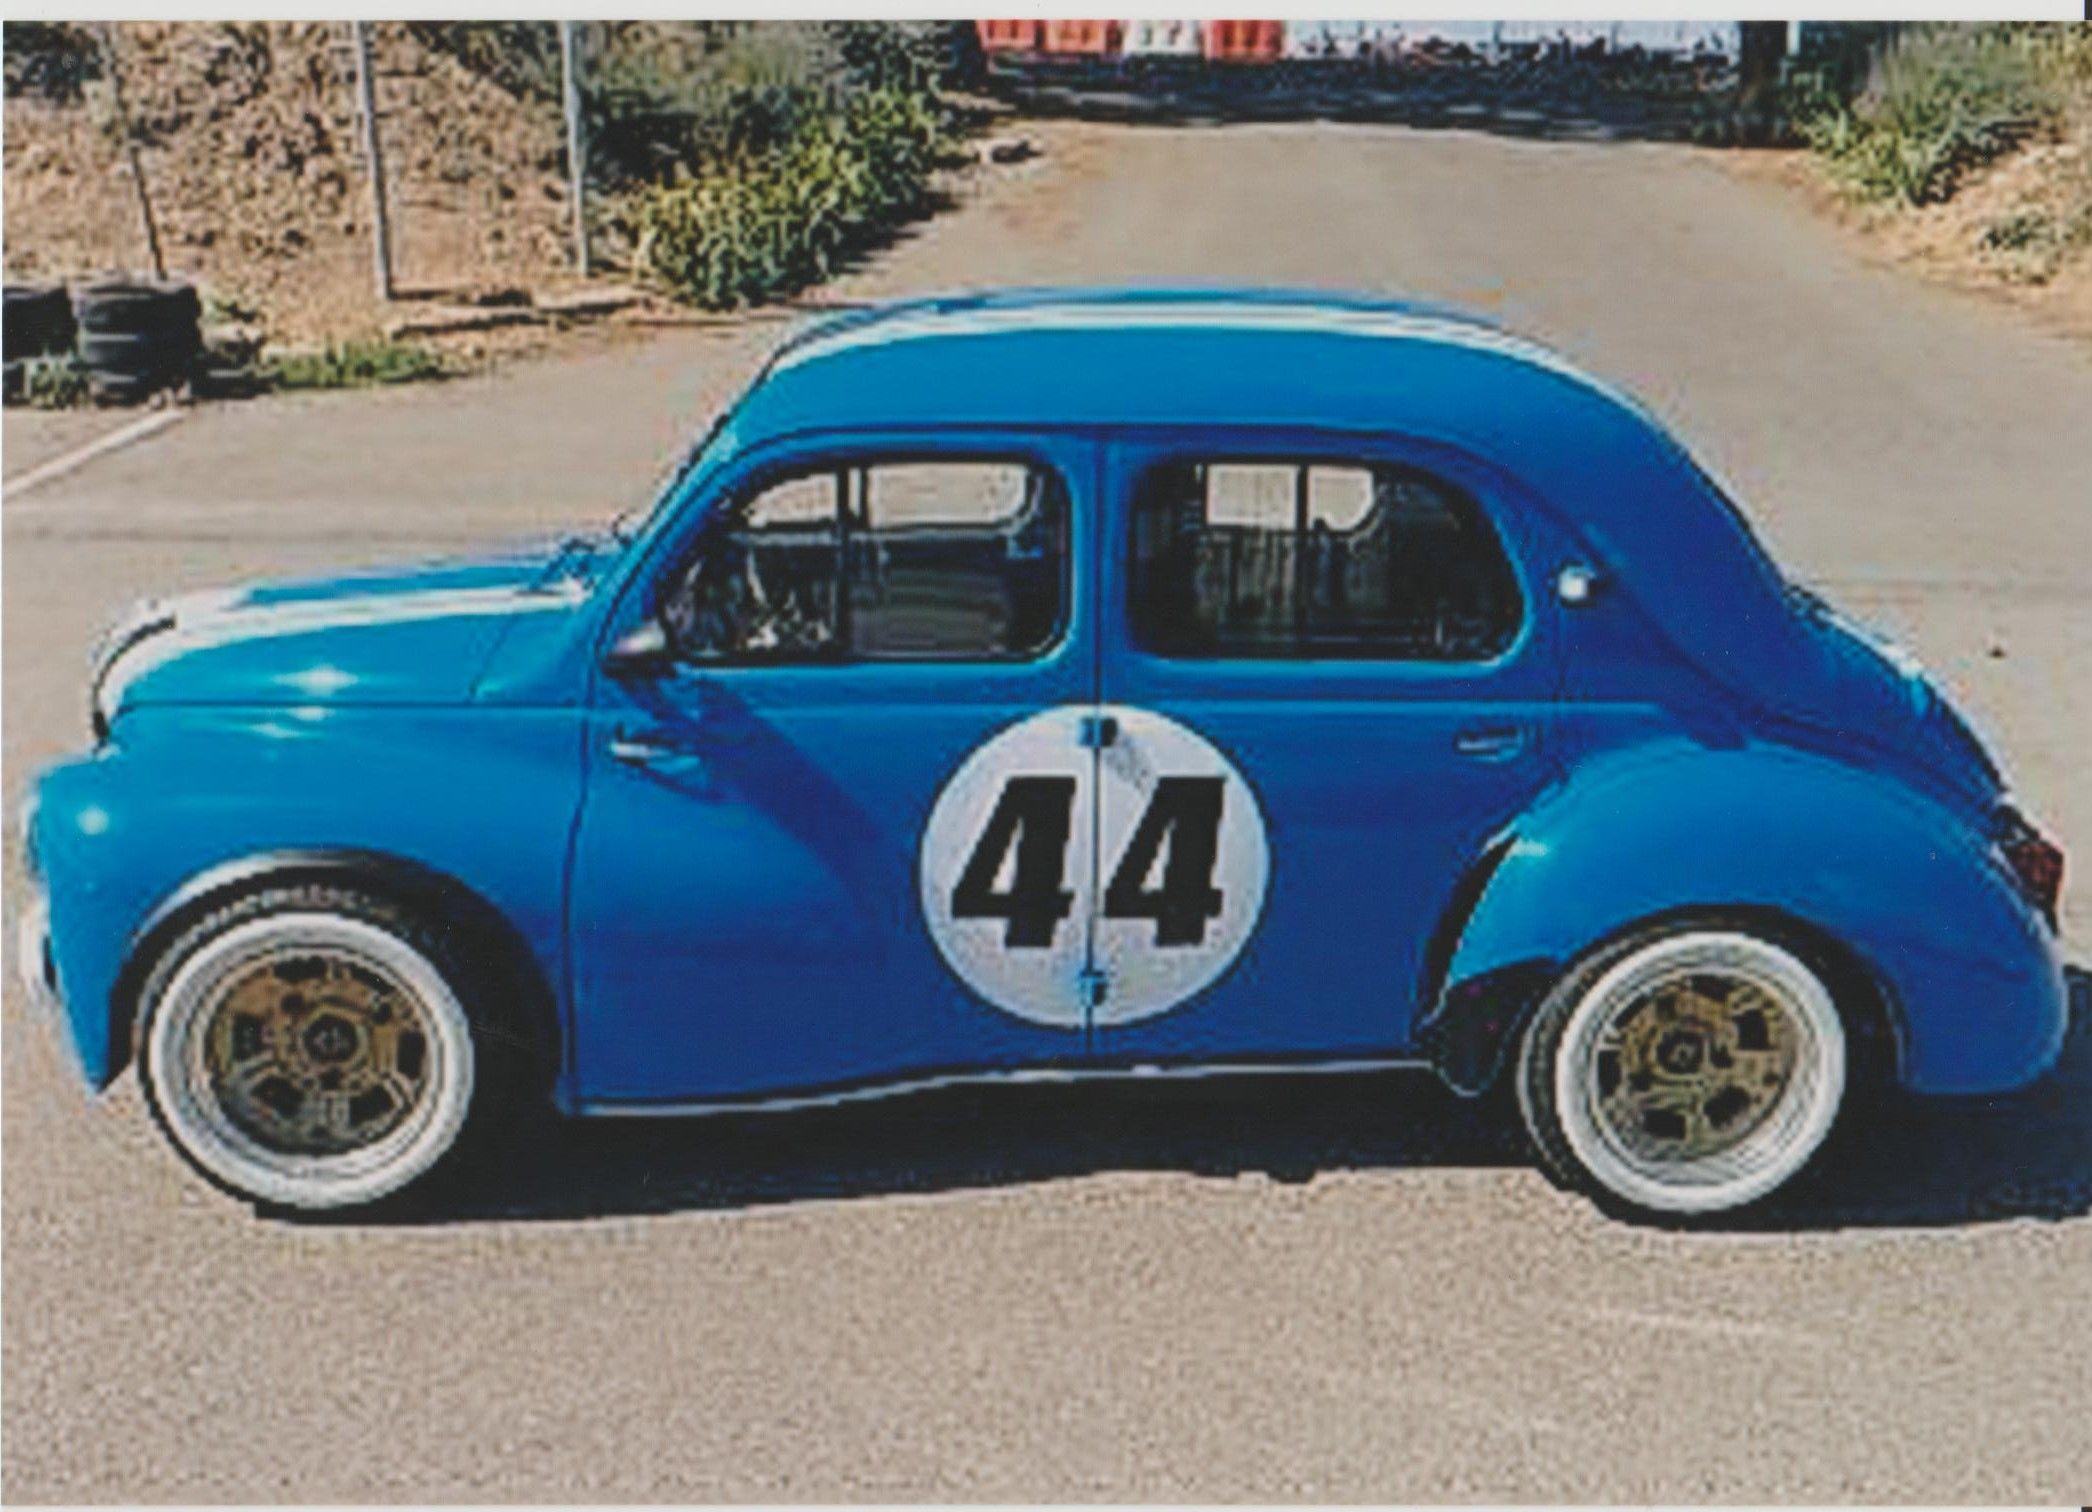 4 Cv Proto Inconnu Pays Portugal Renault Voiture Sport